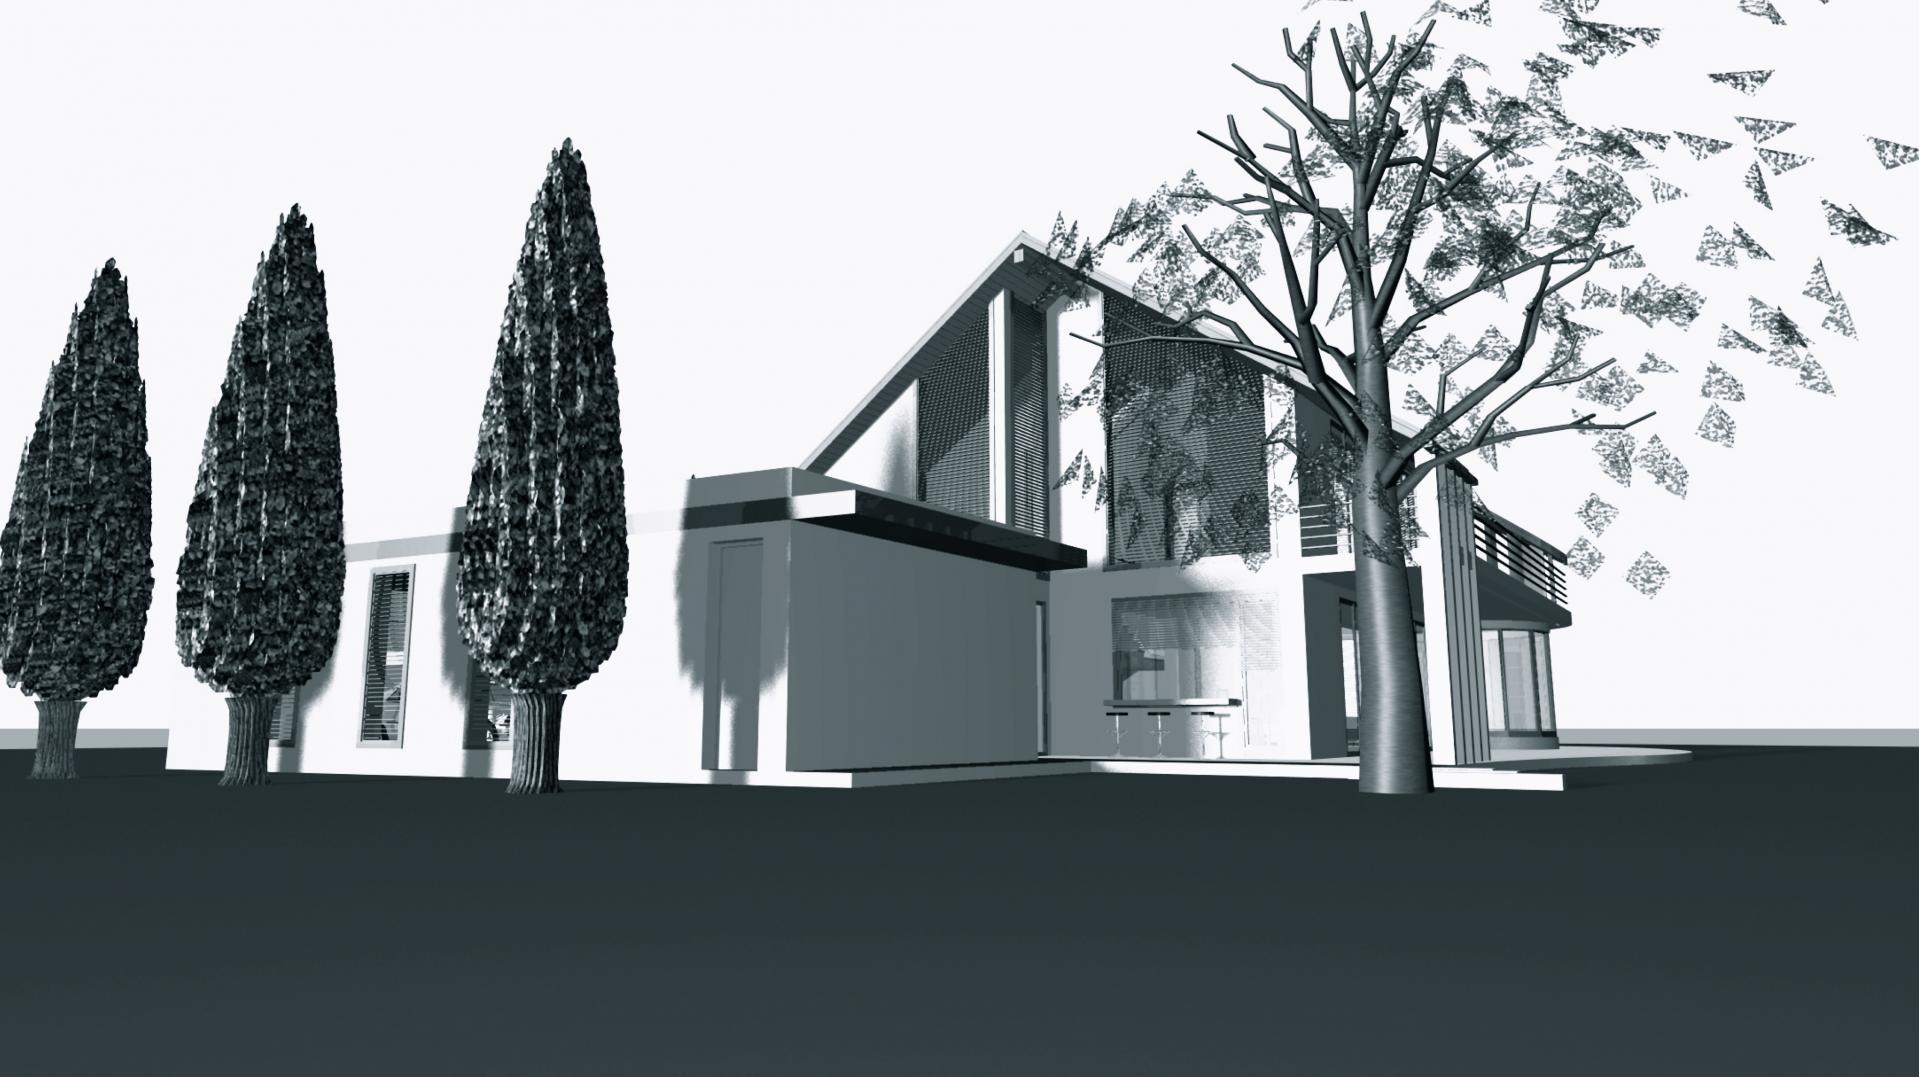 stanovanjska stavba